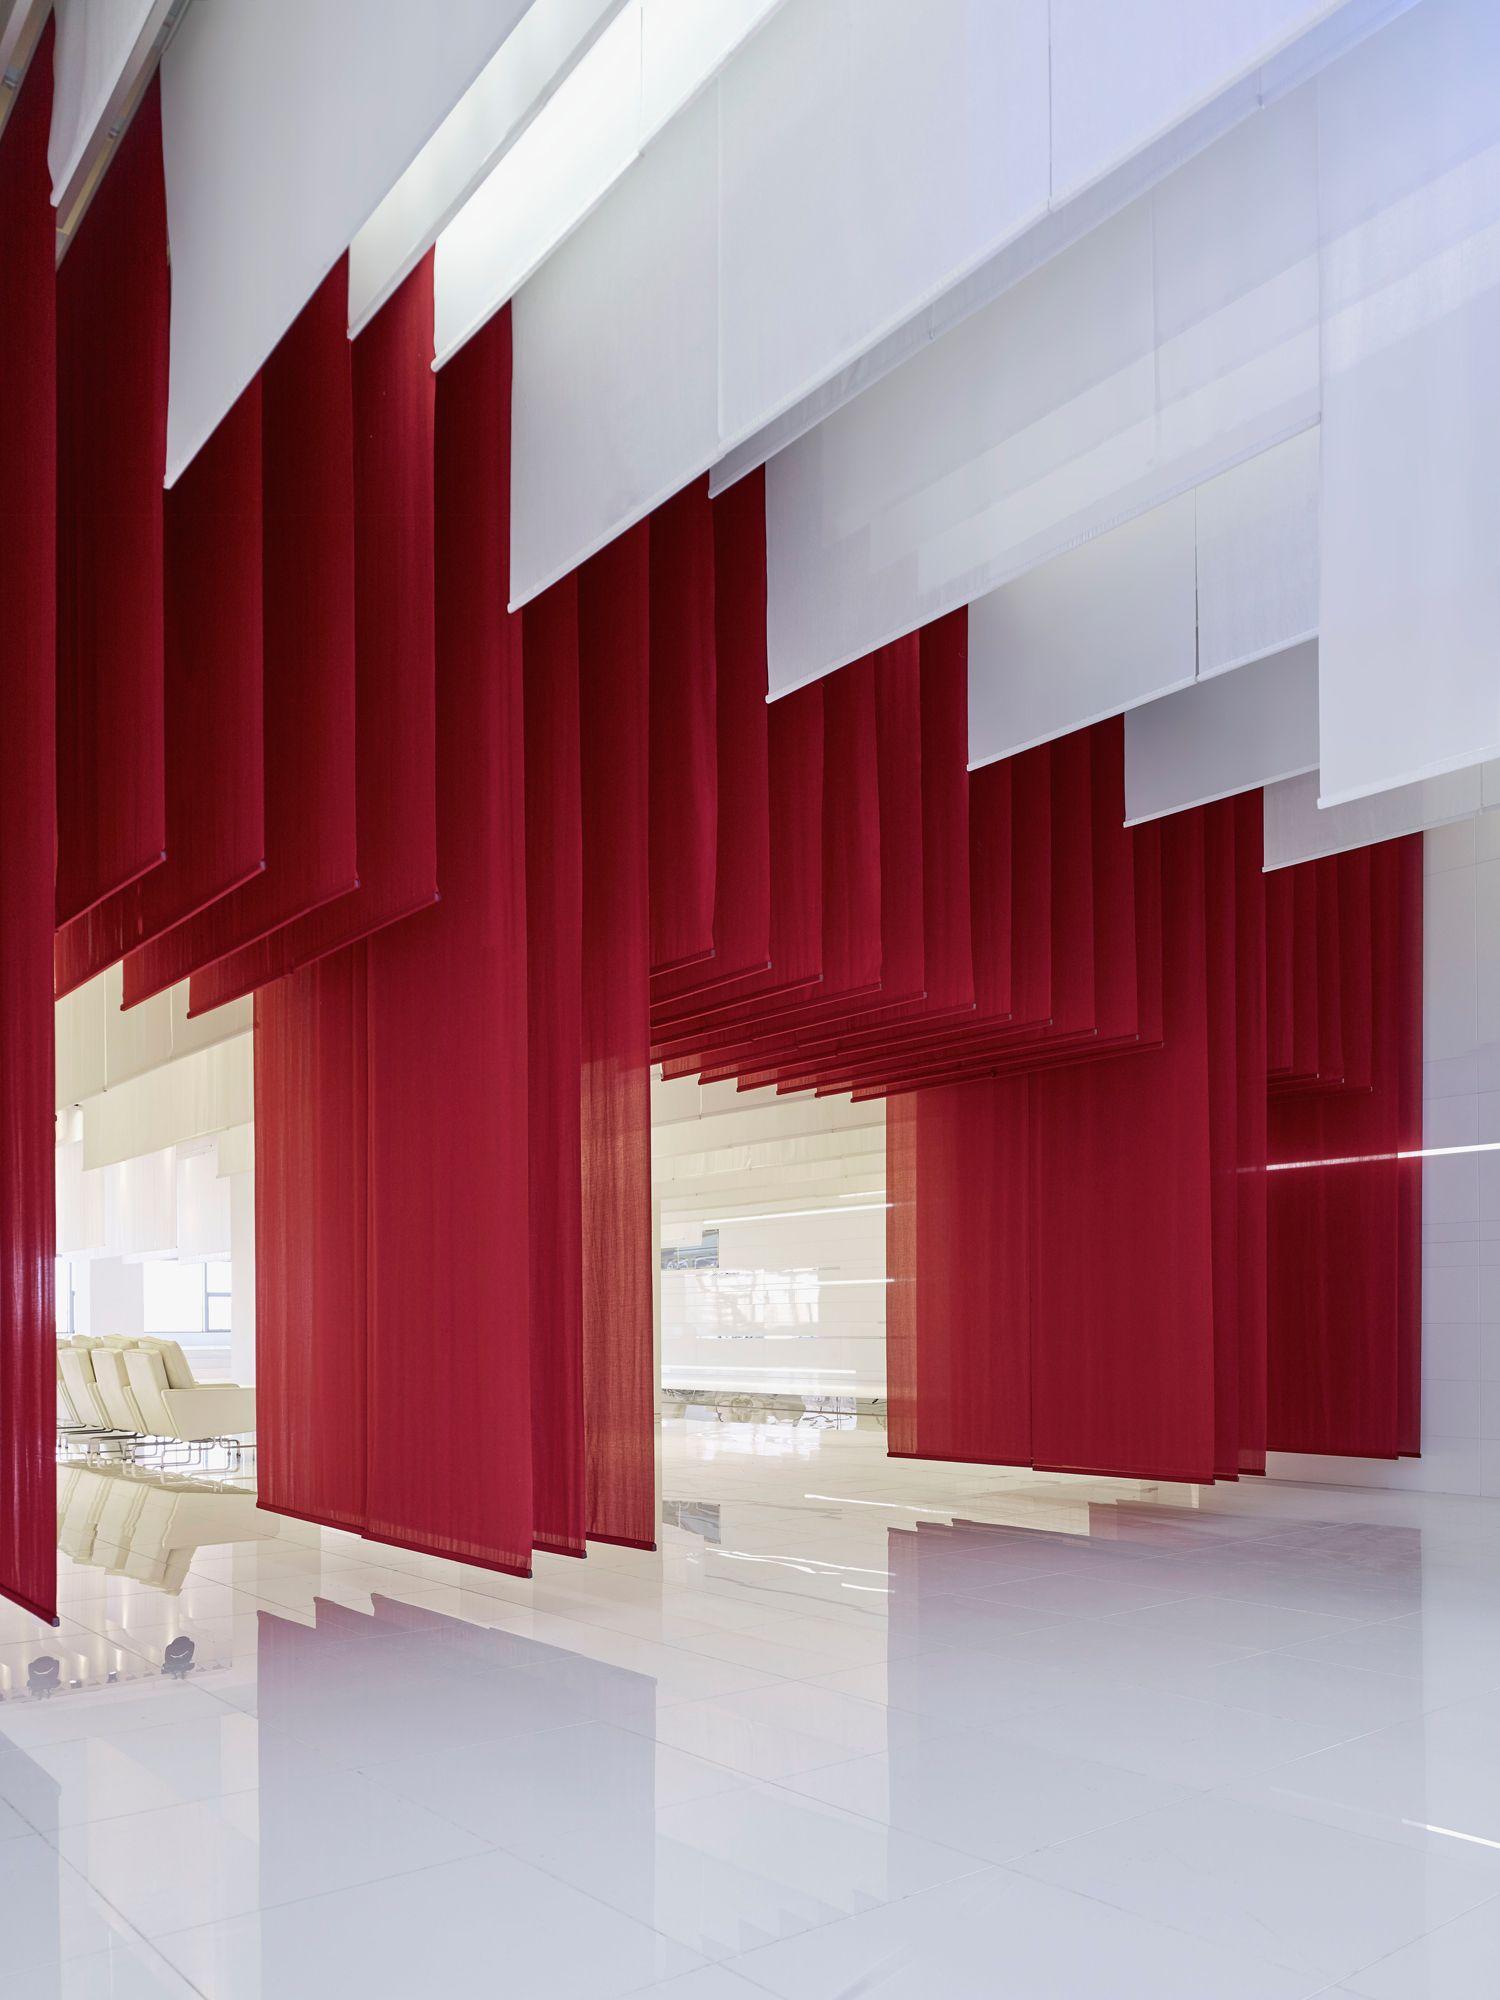 Soft spots heimtextil 2019 art interior design bmw for Design museum frankfurt